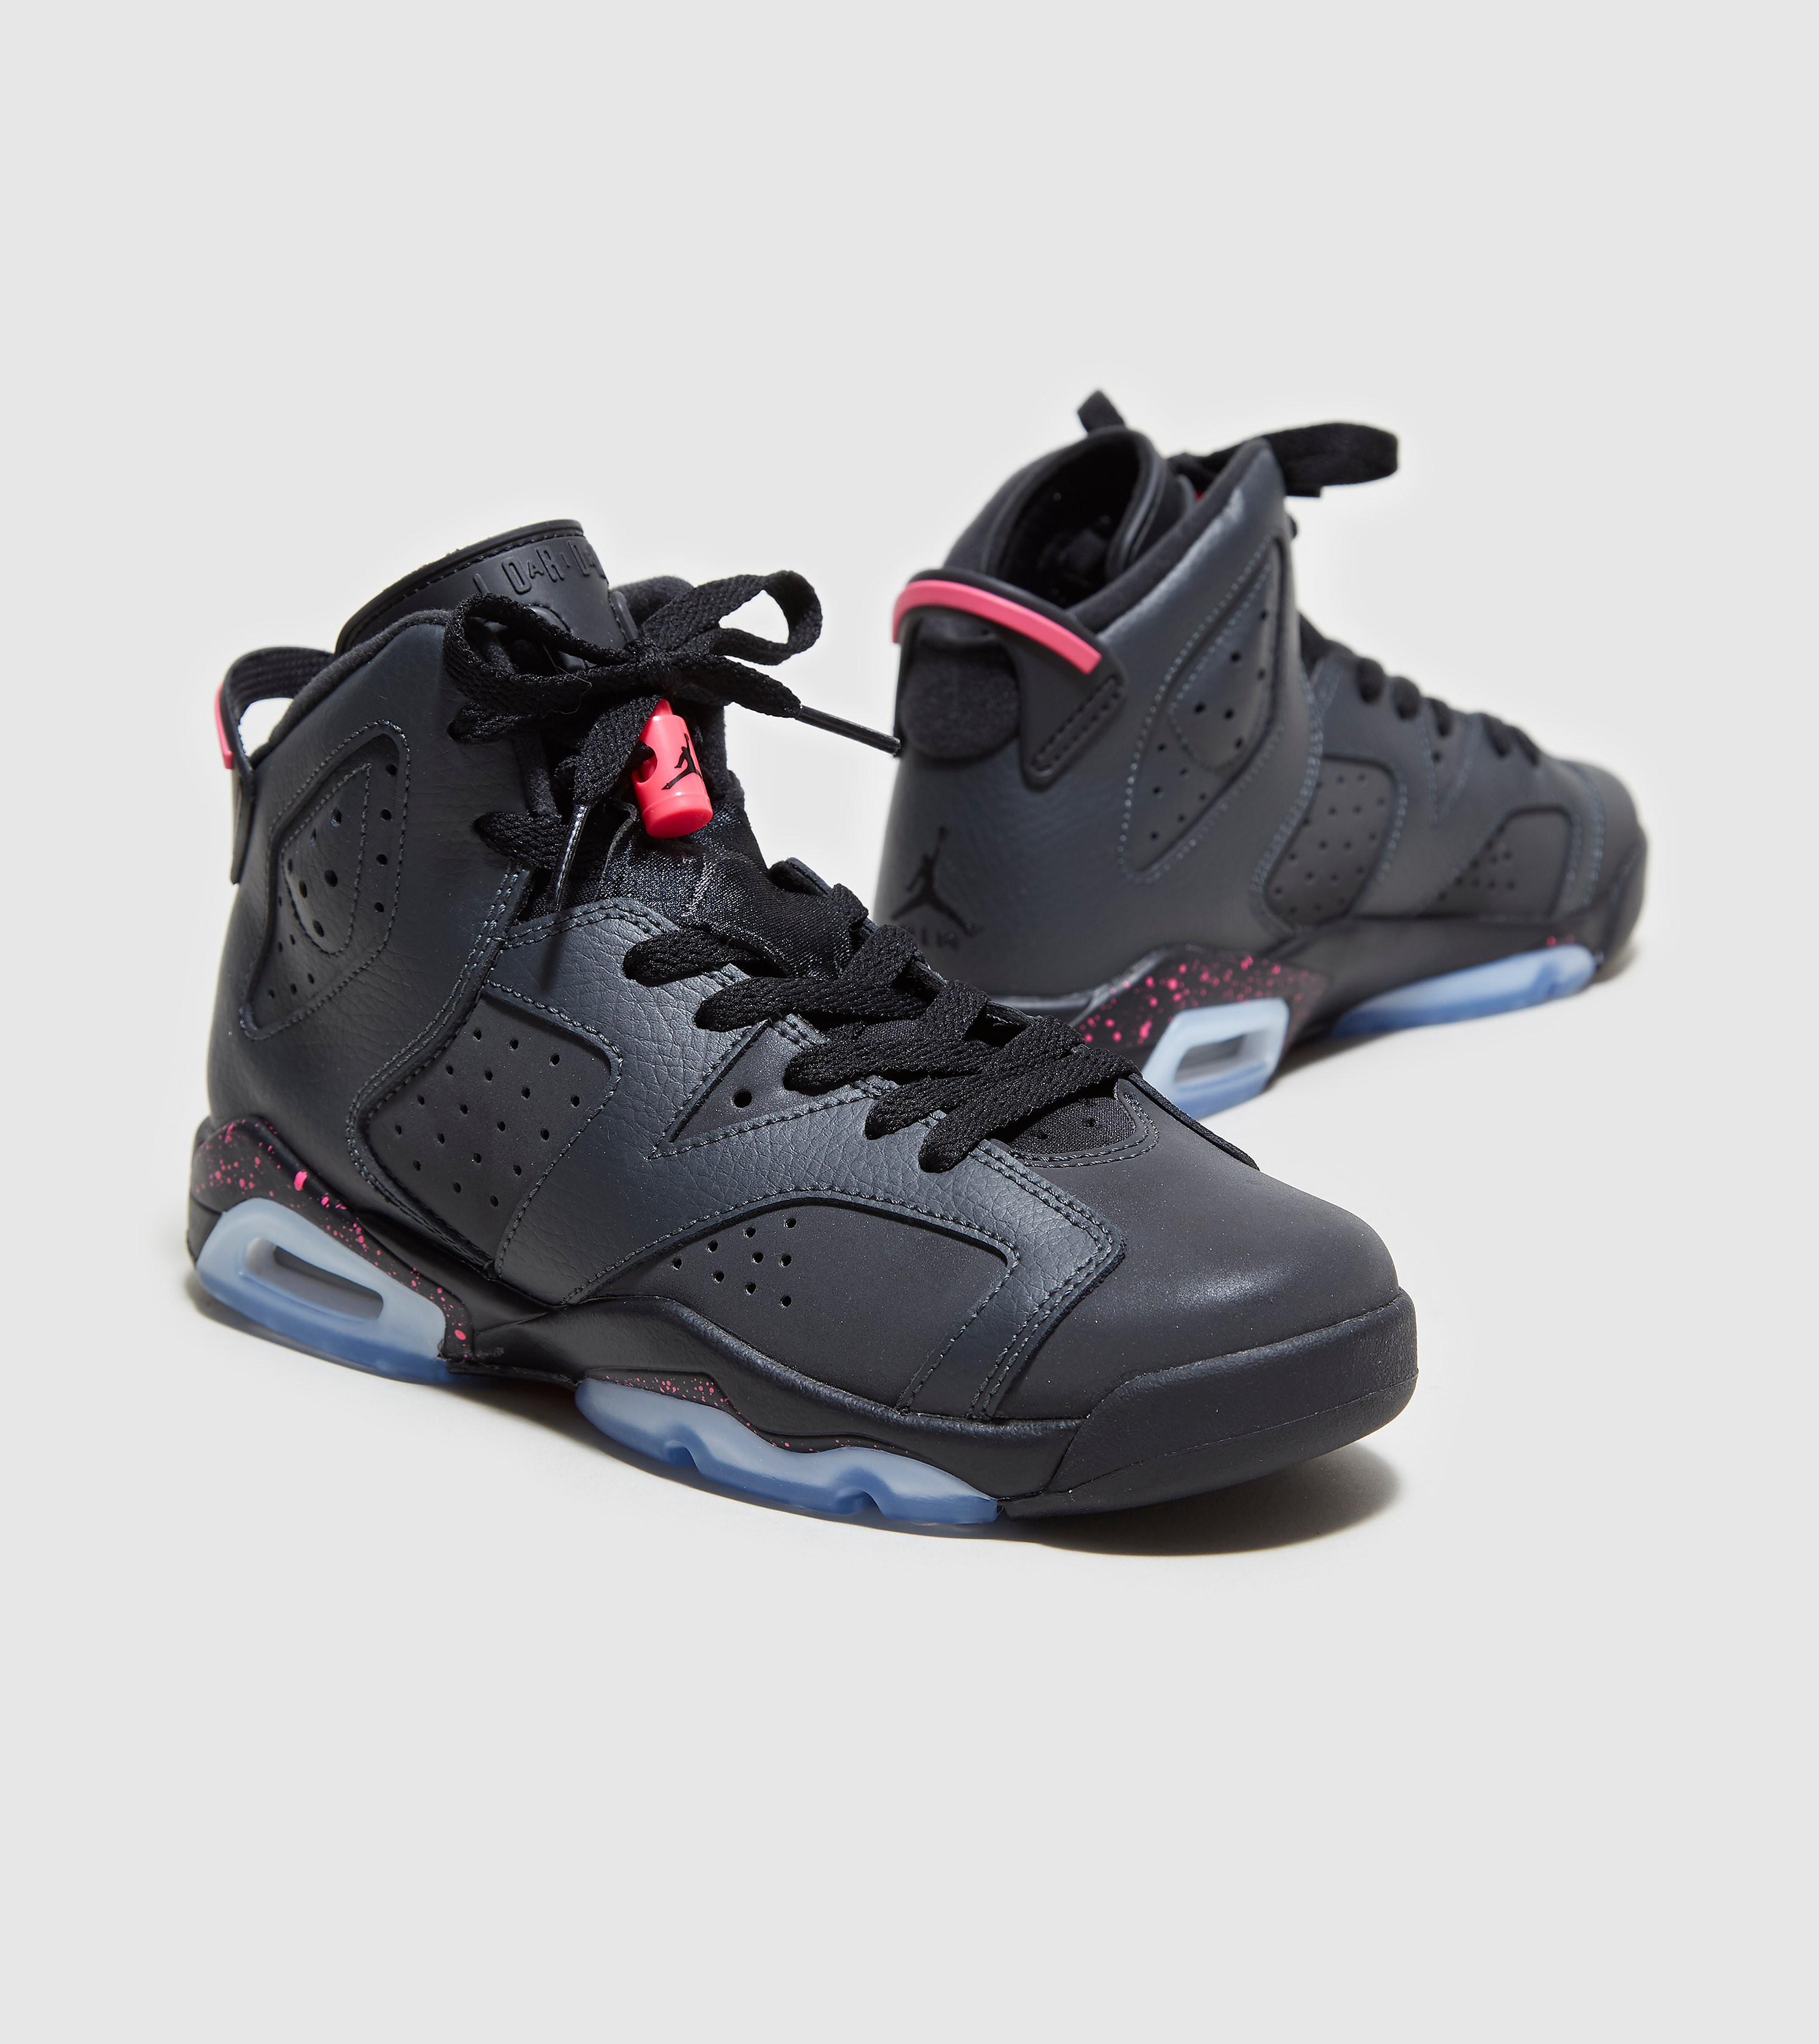 Jordan 6 Retro GG 'Hyper Pink'